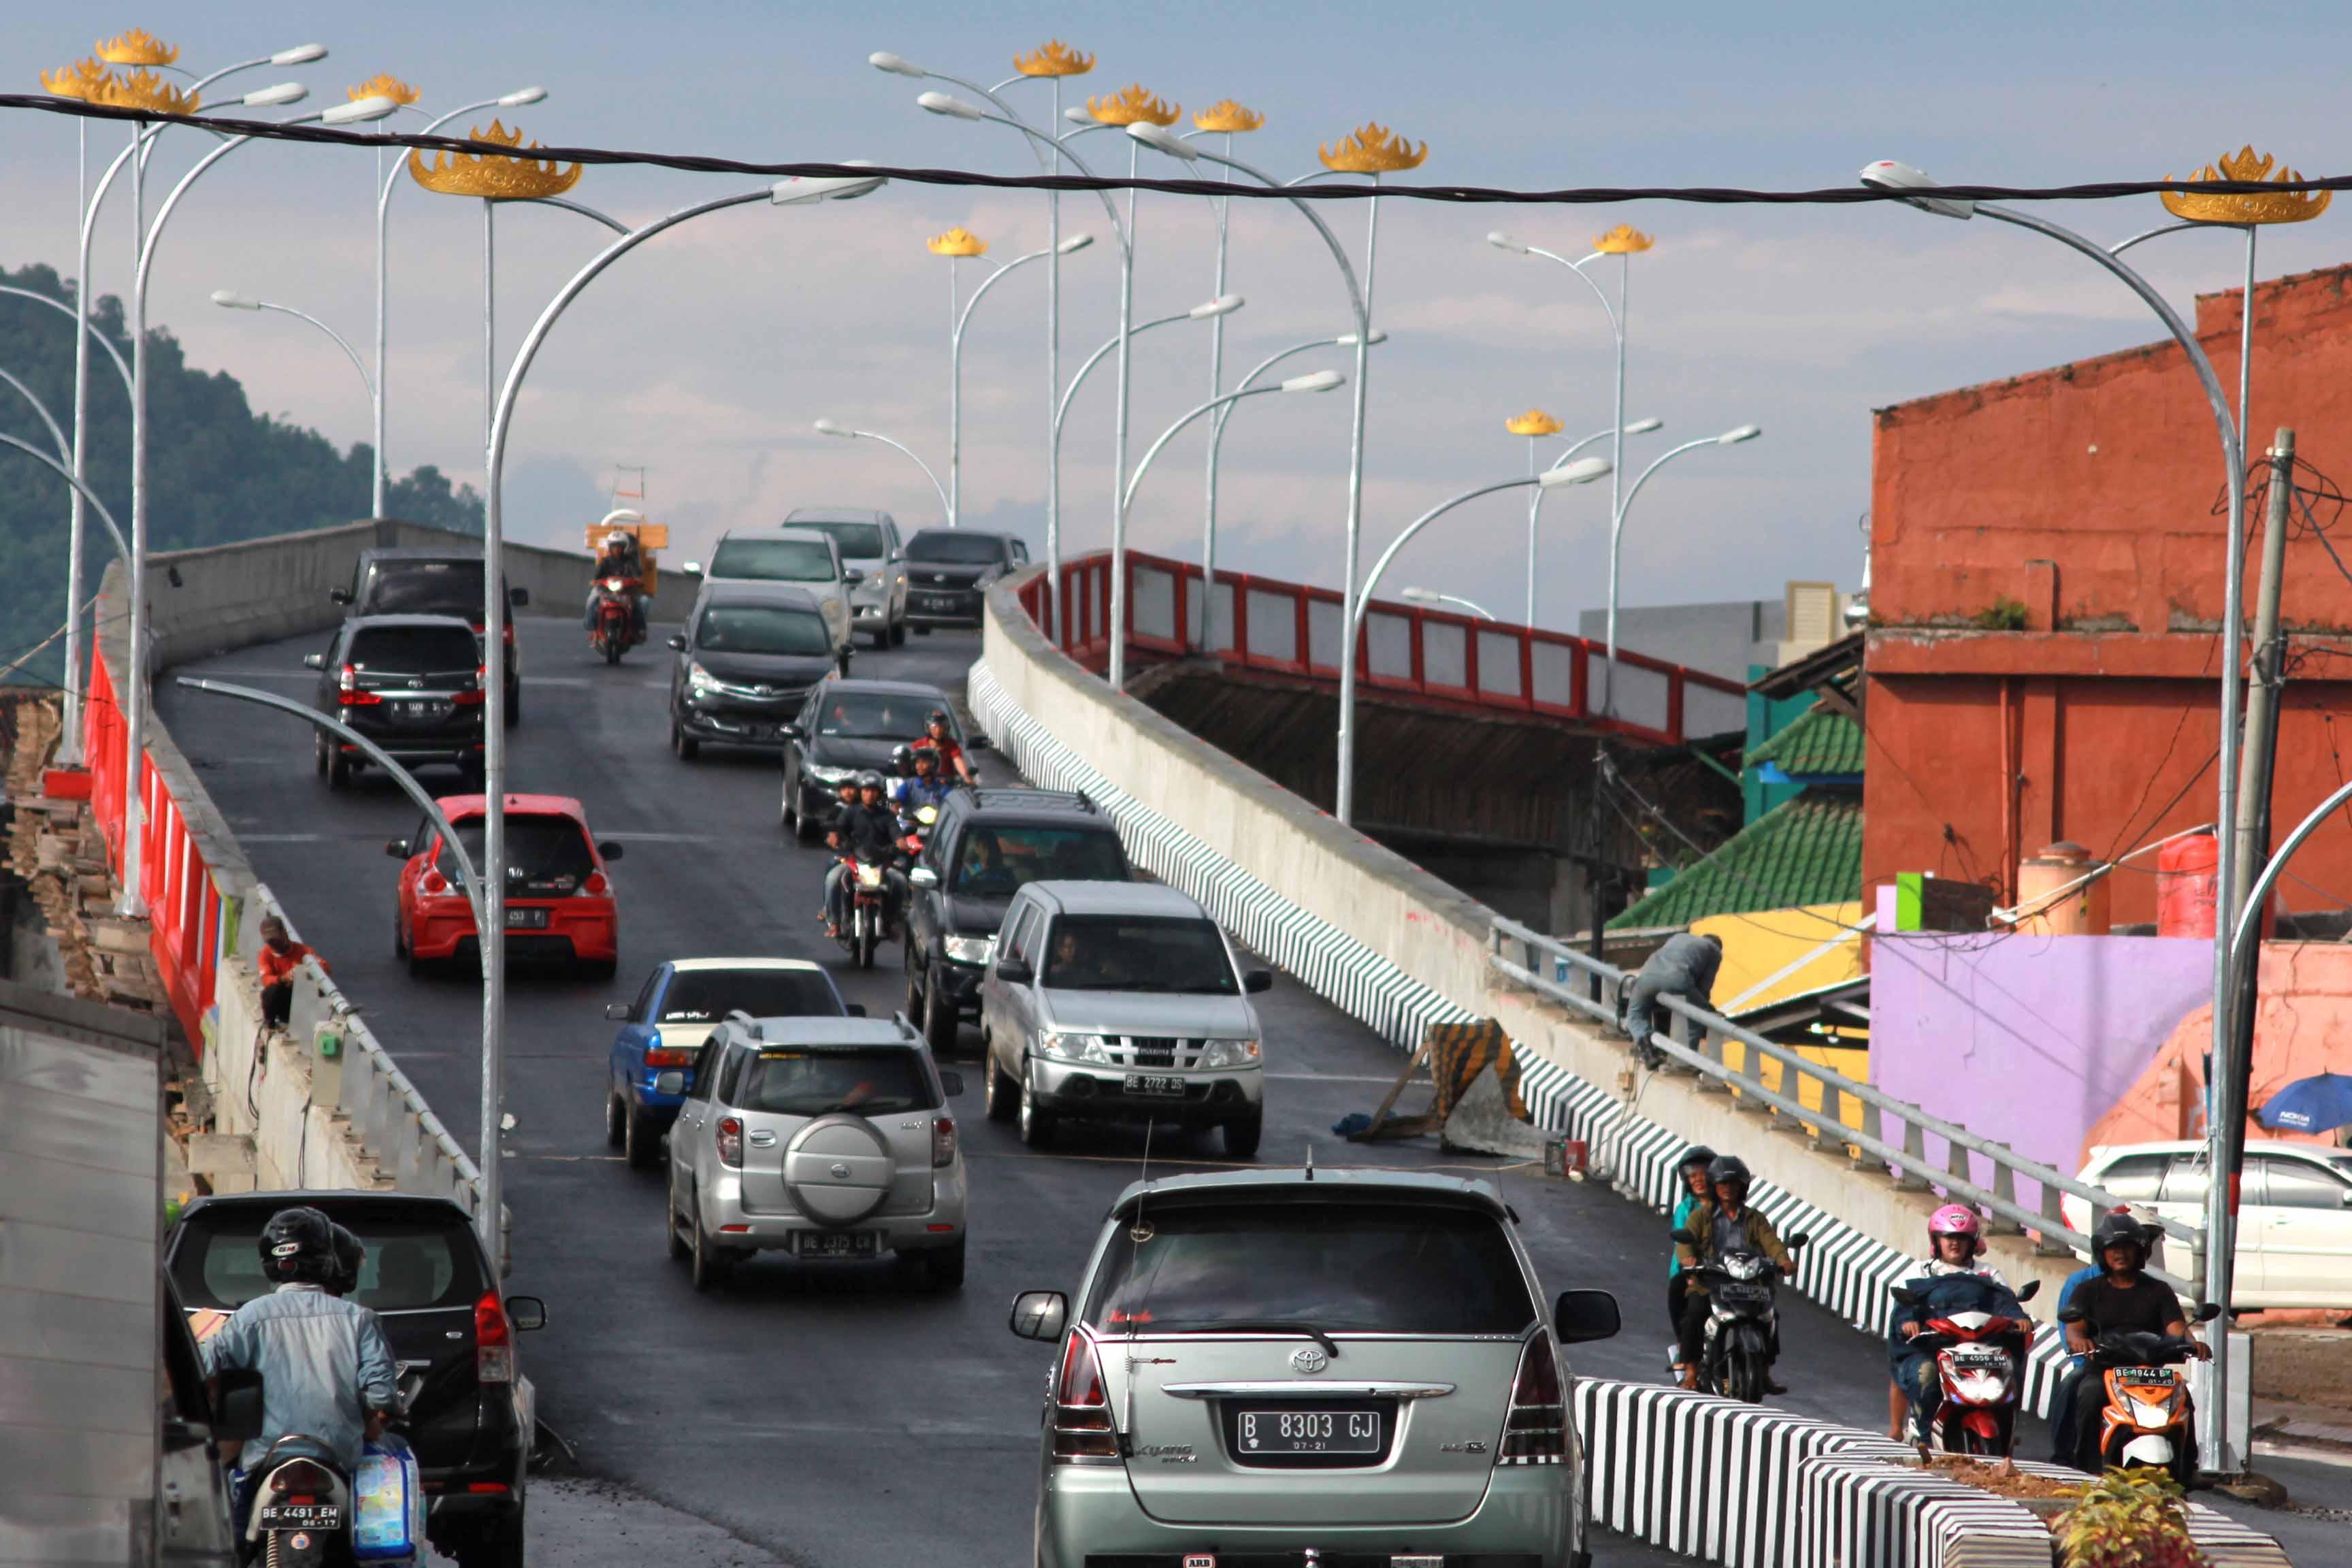 Sejumlah kendaraan melintasi flyover Jalan Gajah Mada - P Antasari Bandarlampung (Lampungnews.com/El Shinta)